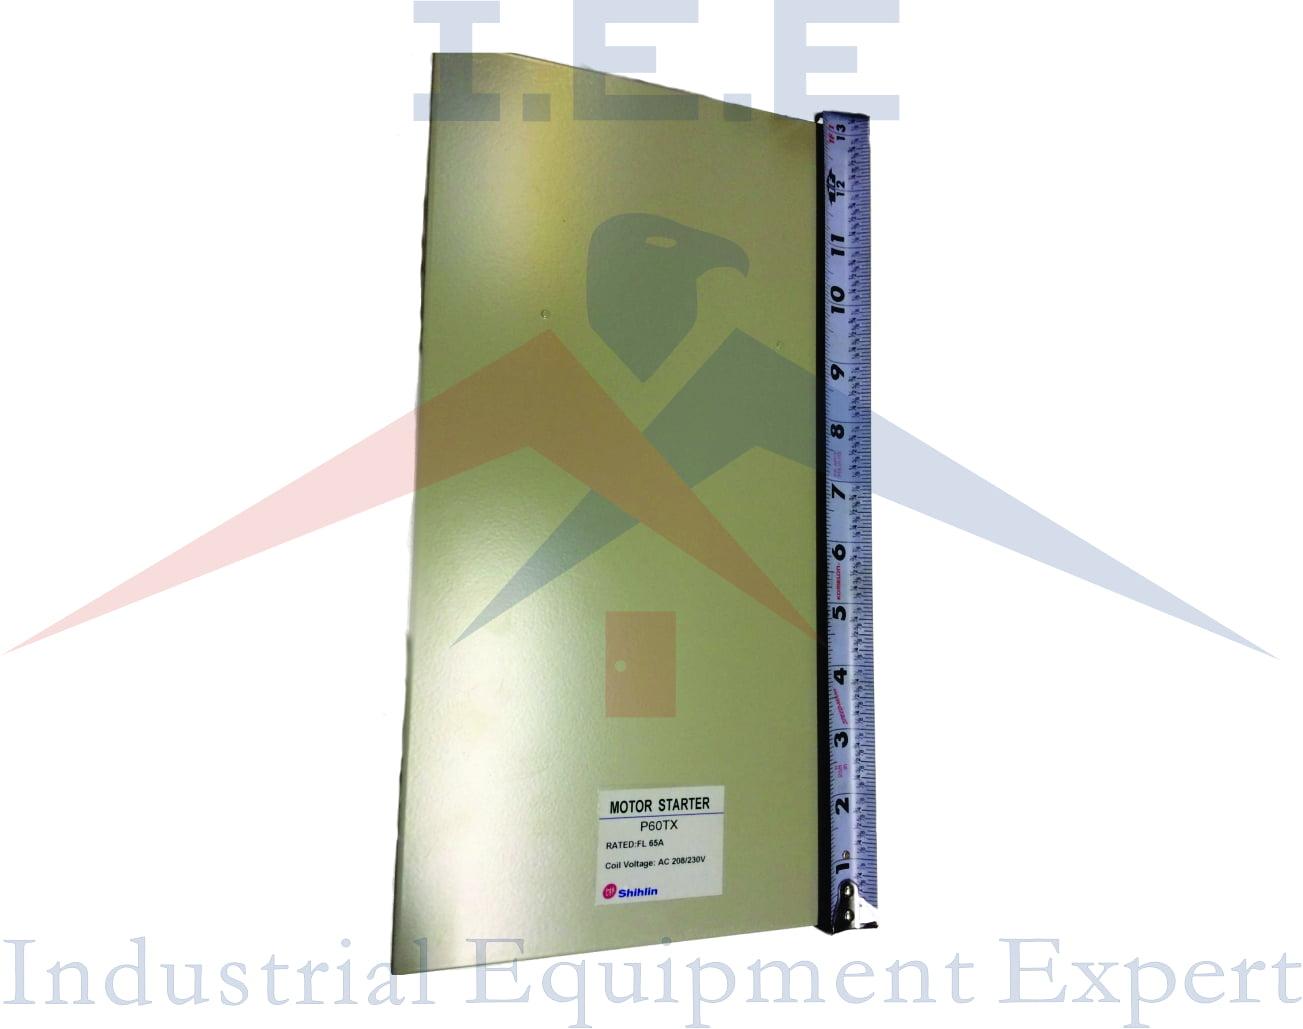 Shihlin P60TX 20 HP Three Phase Magnetic Starter Motor Control 230V 65 Amp